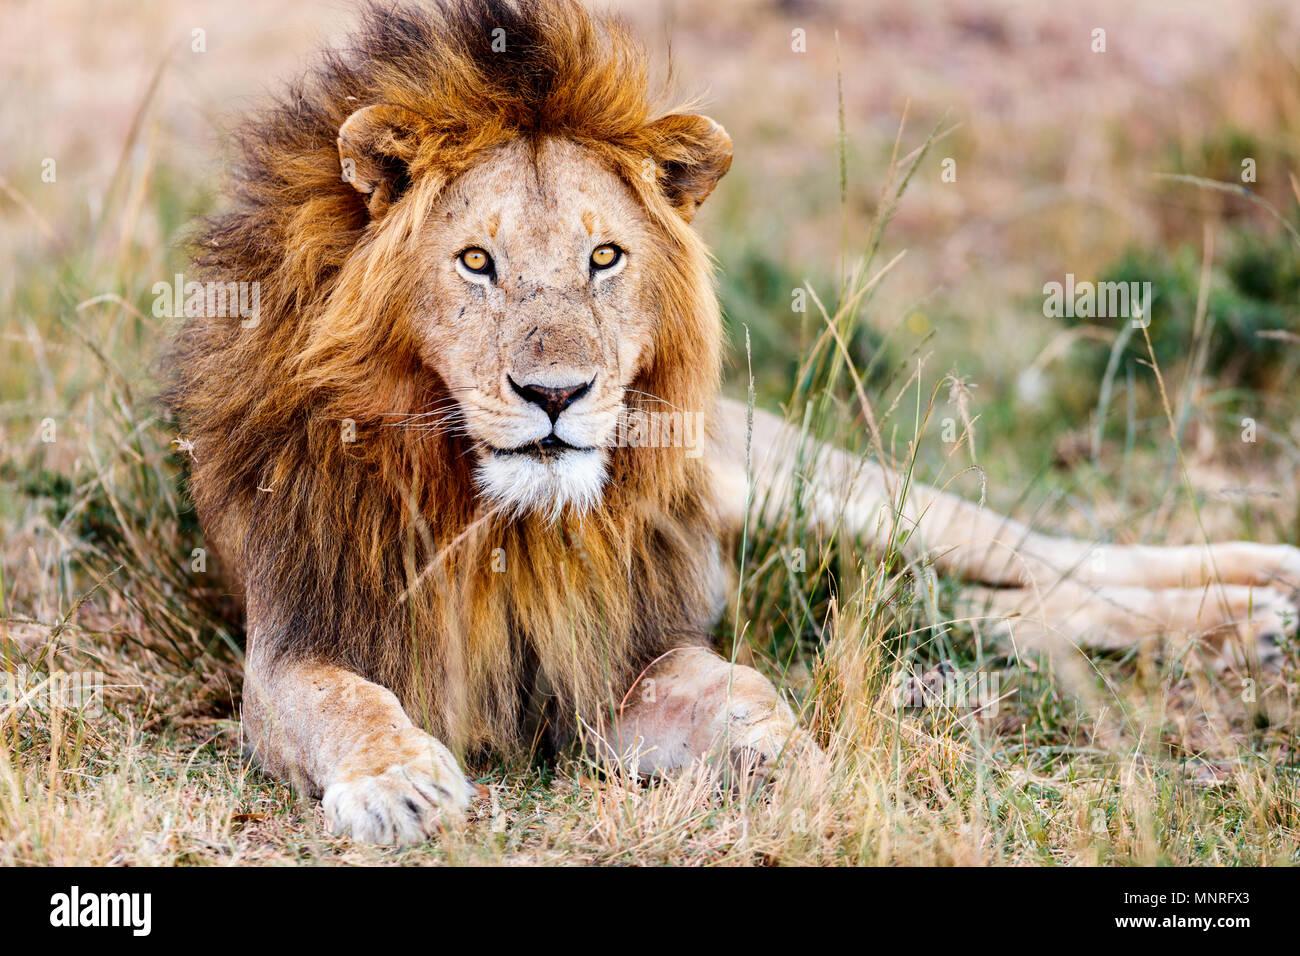 Maschio di leone giacente in erba nella savana in Africa Immagini Stock